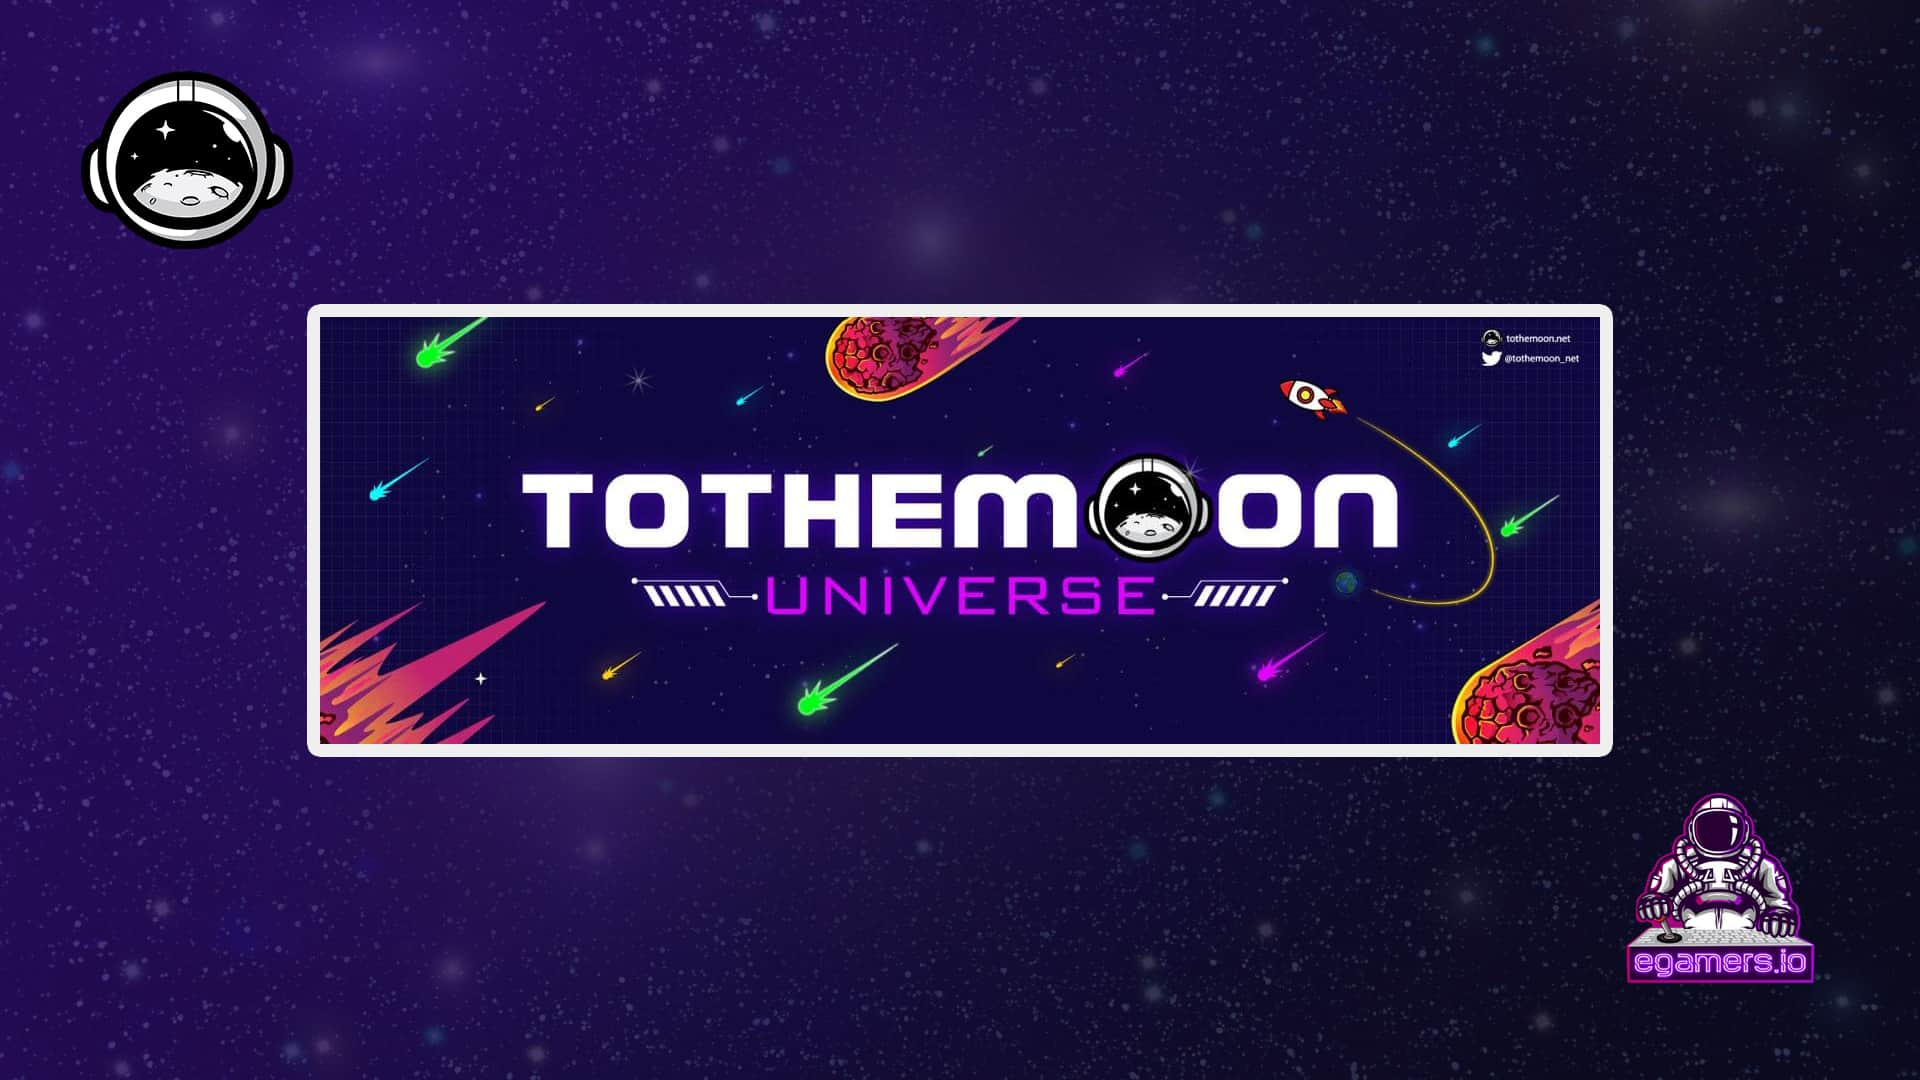 TOTHEMOON Universe main image